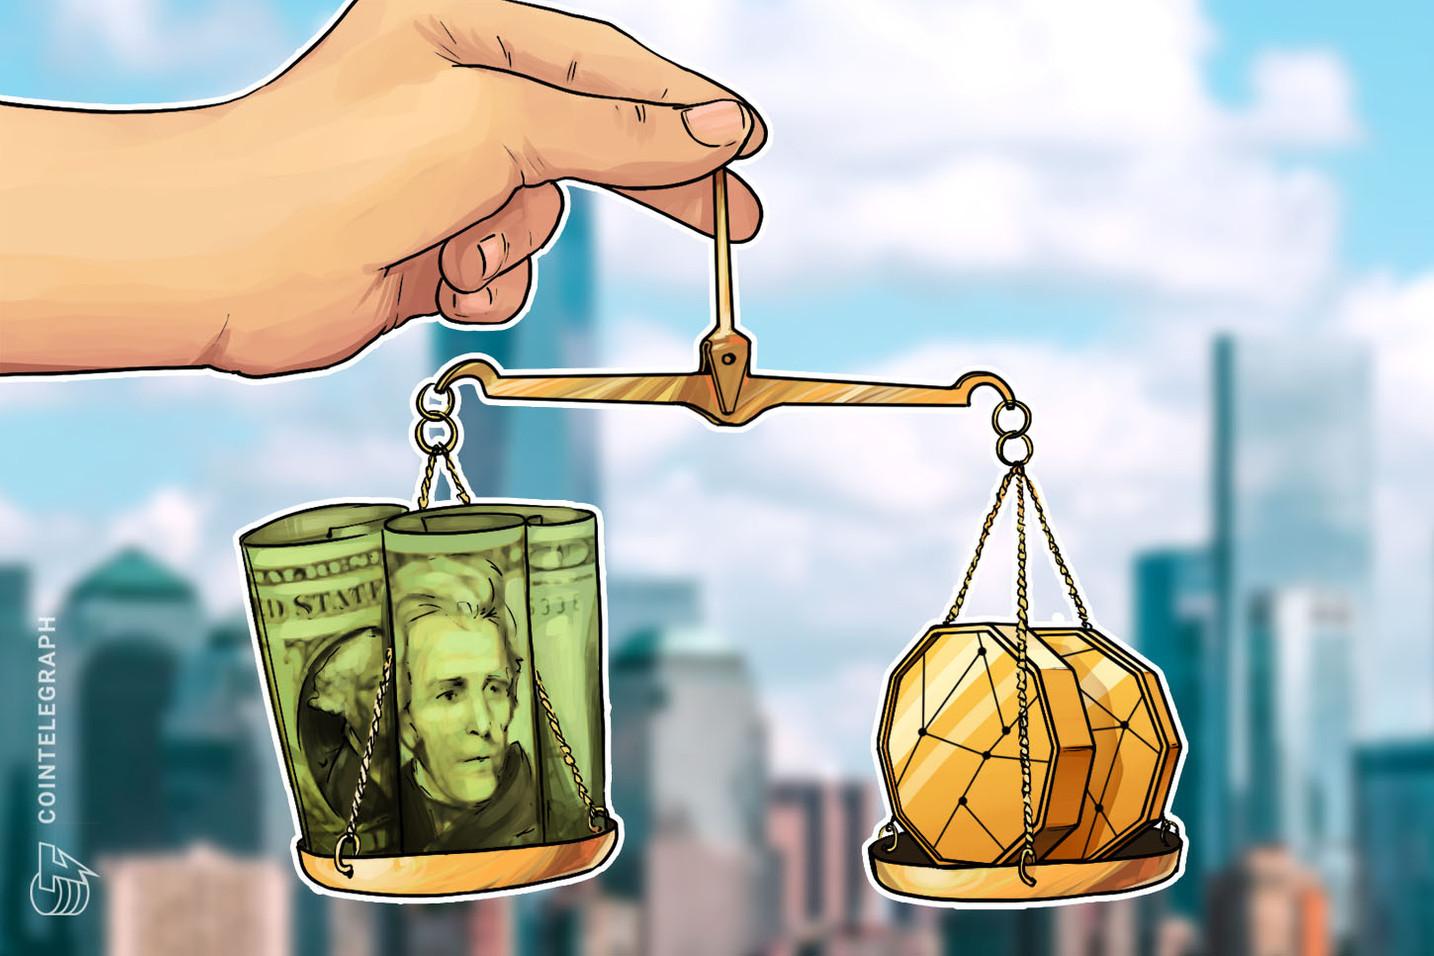 Japan: Crypto Trading Platform Liquid Hits Unicorn Status With Over $1 Billion Valuation